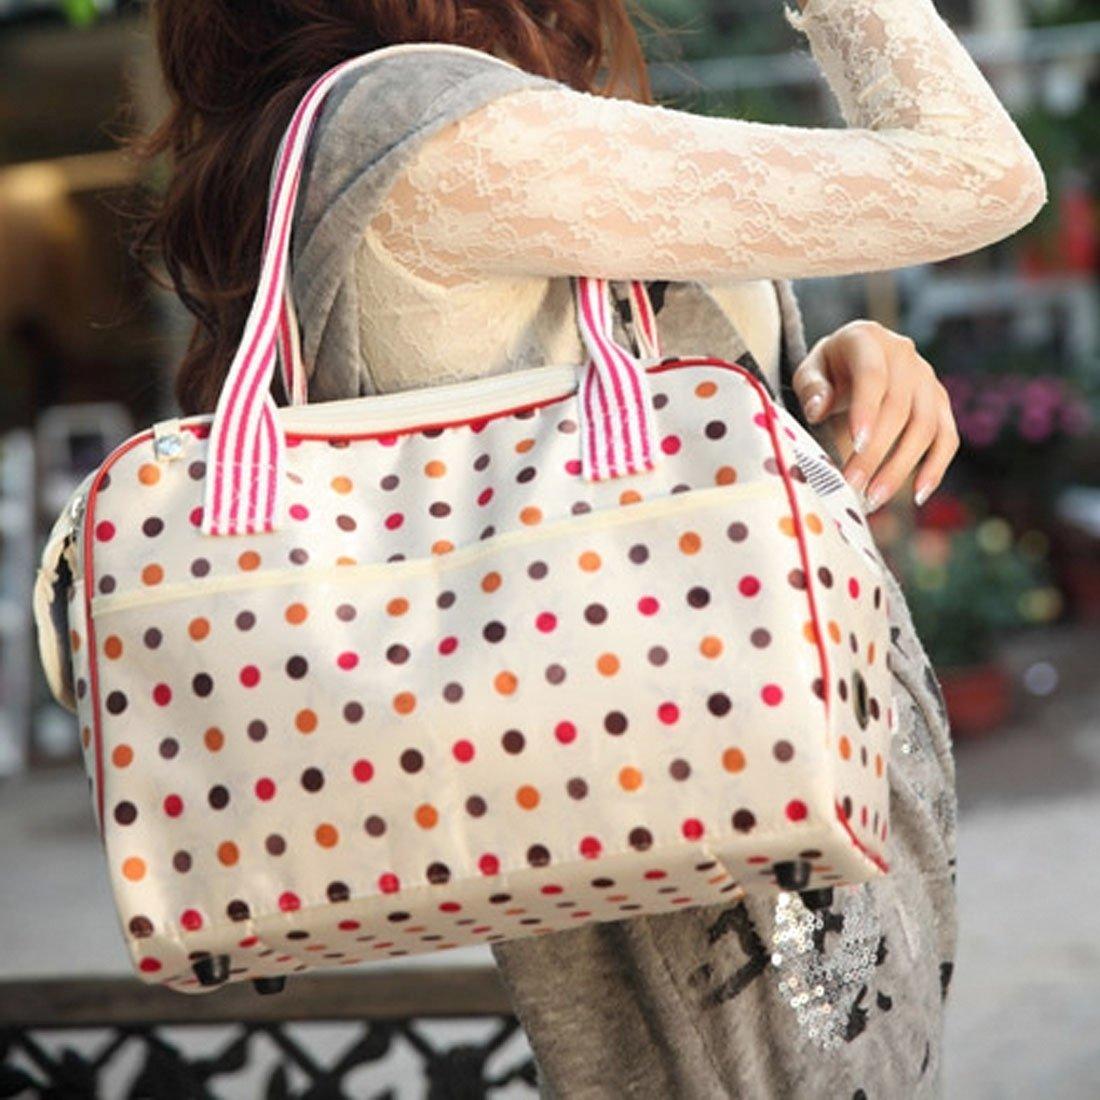 Hc5202c YongYeYaoBEN Shoulder Bag for Cat Dog and oher Pets Medium Portable Pet Handbag, Size 40  28  17cm (SKU   Hc5202c)